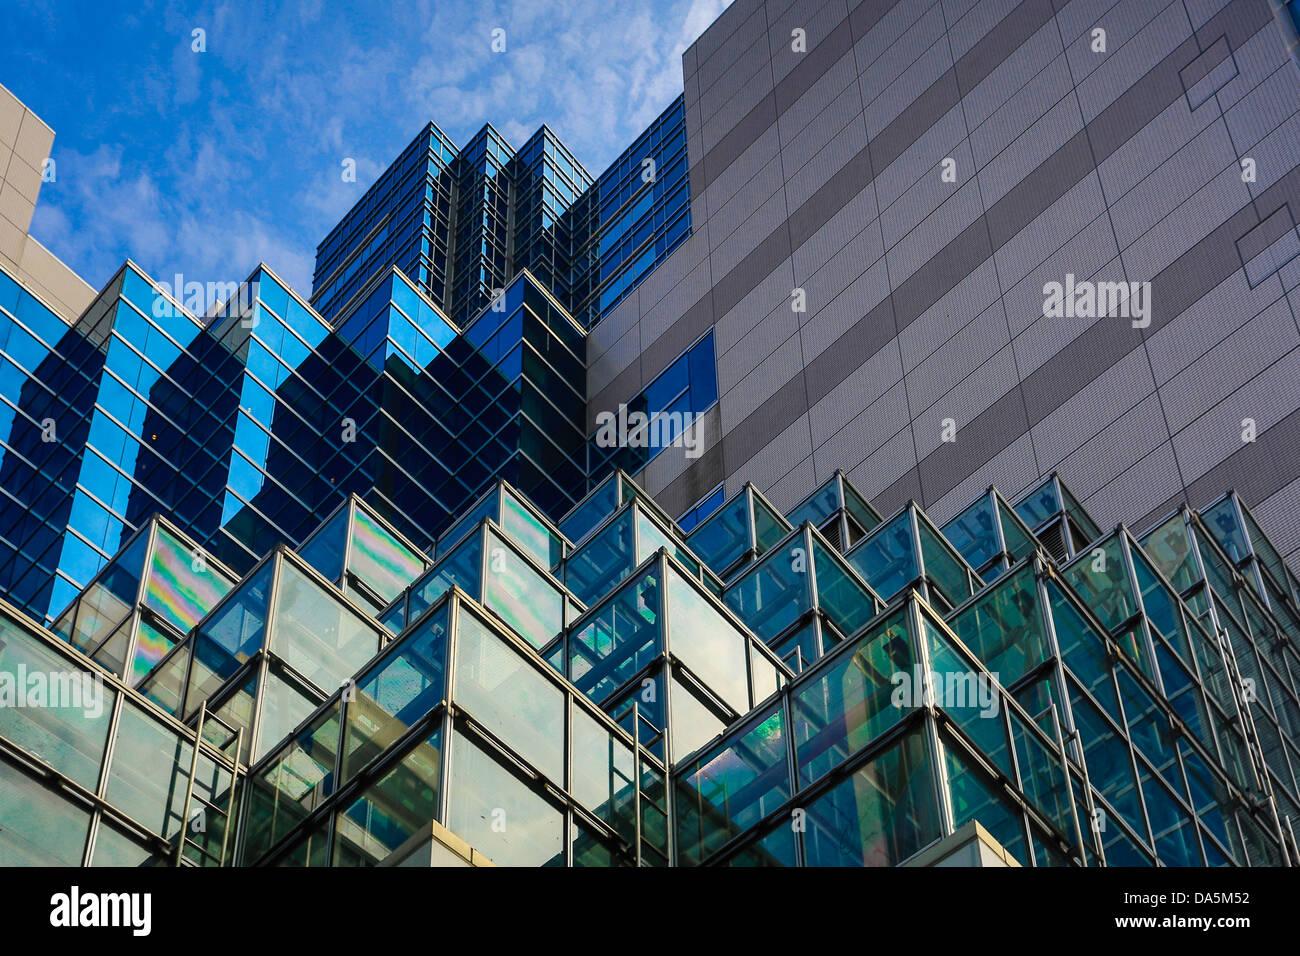 Japan, Asien, Tokio, Stadt, Ikebukuro, Bezirk, Detail, Architektur, Gebäude, Glas, Ikebukuro, Reflexion, Stockbild